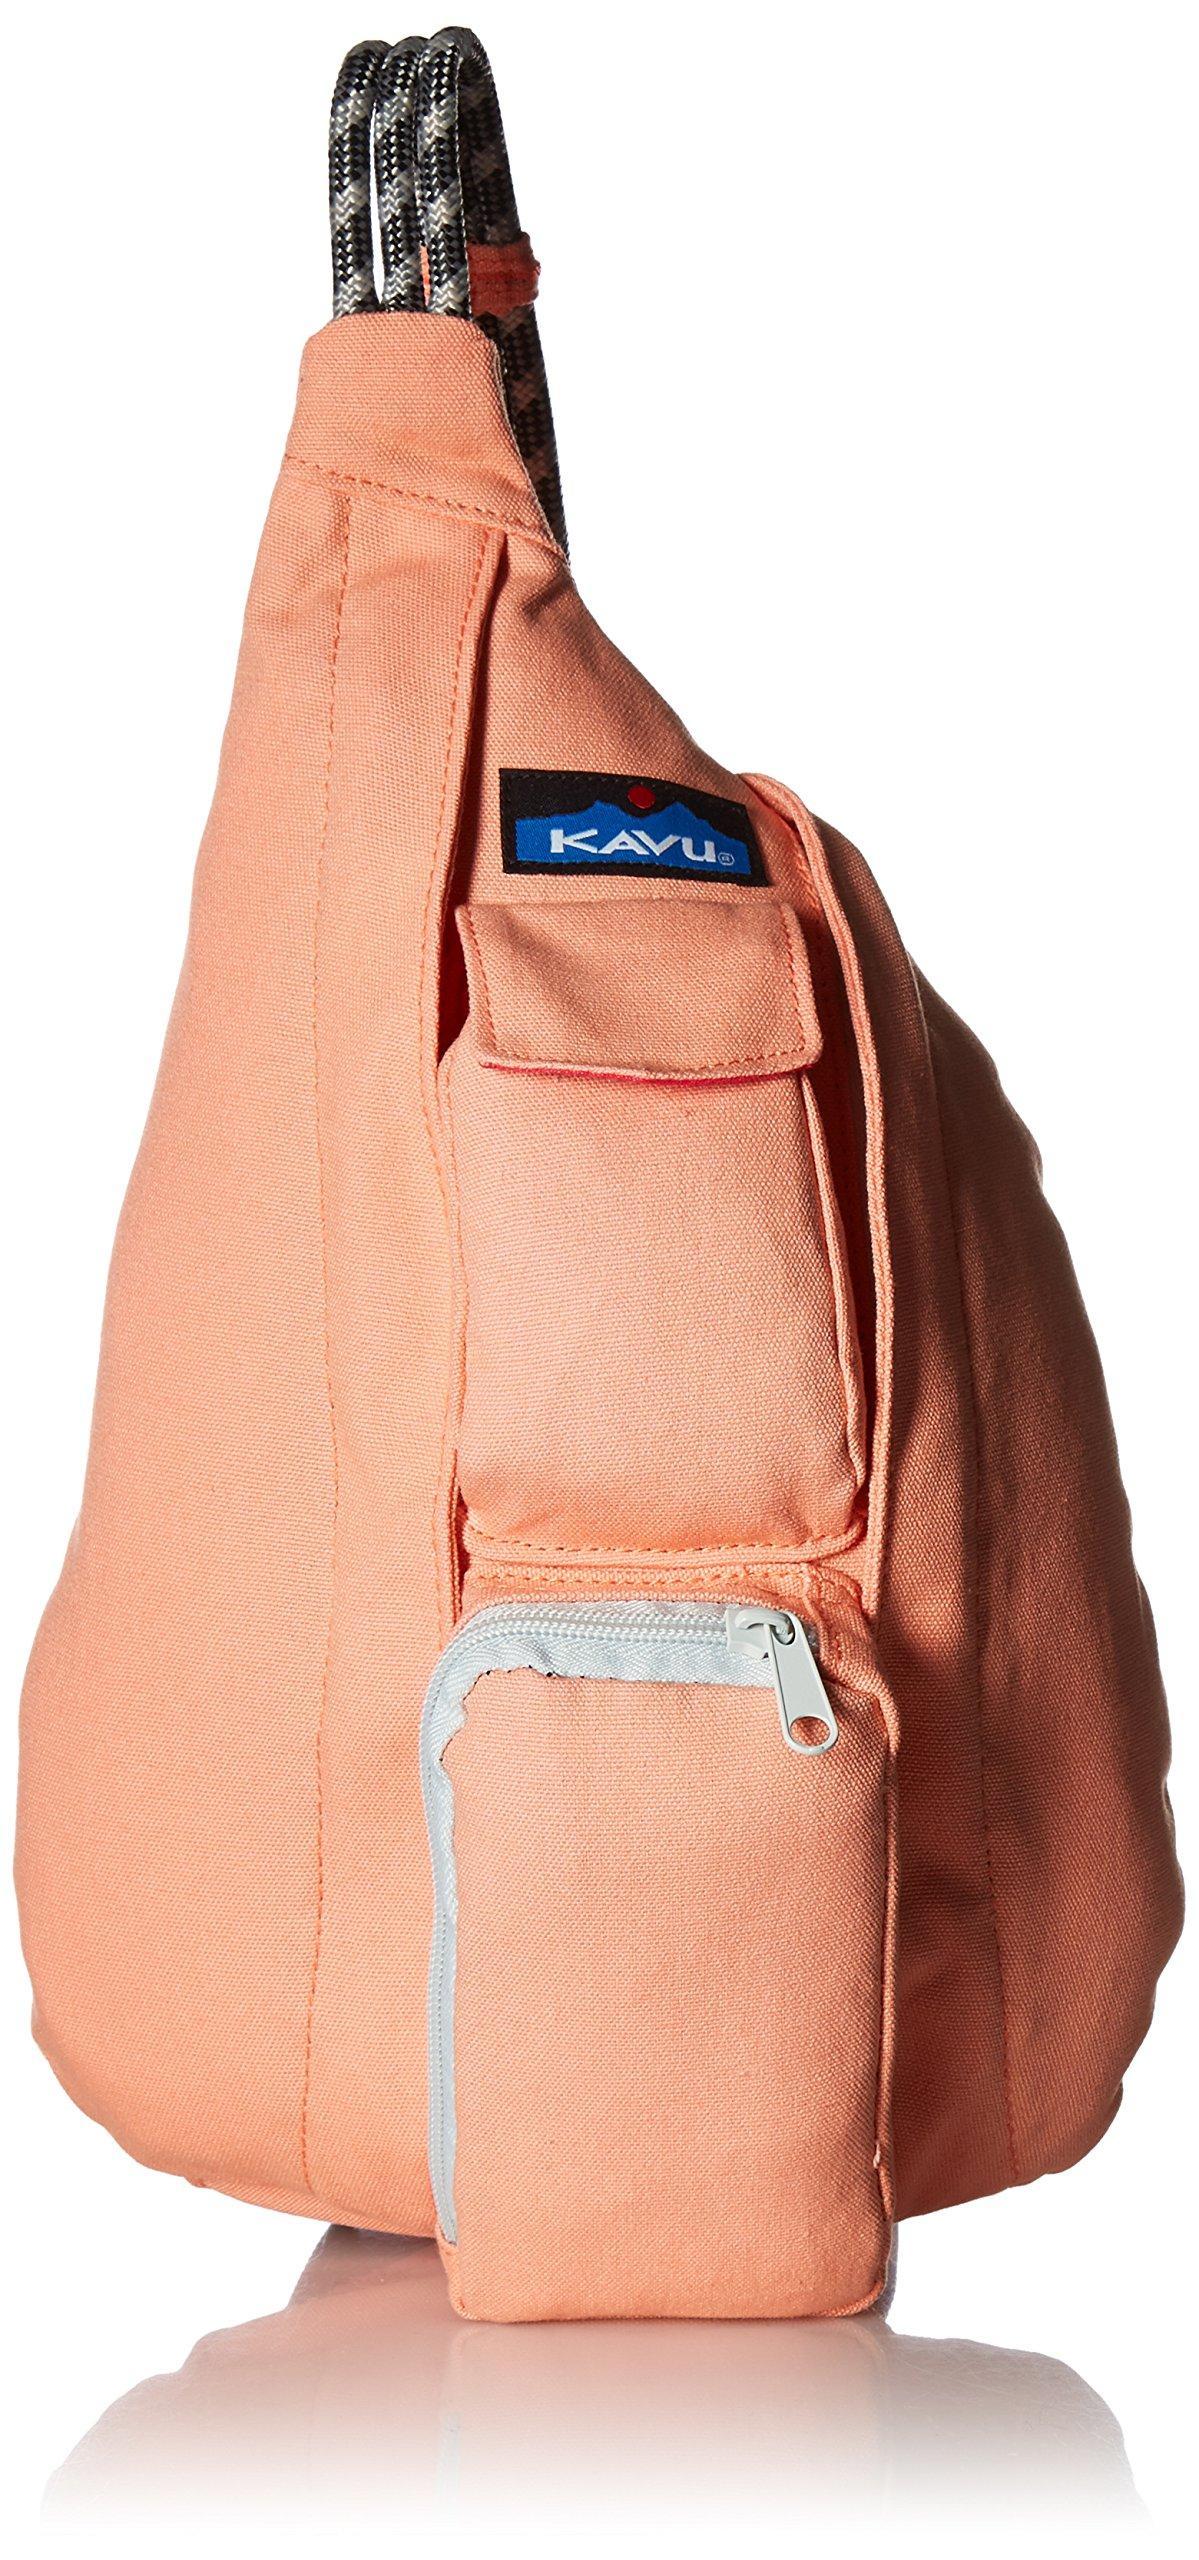 KAVU Mini Rope Bag, Coral, One Size